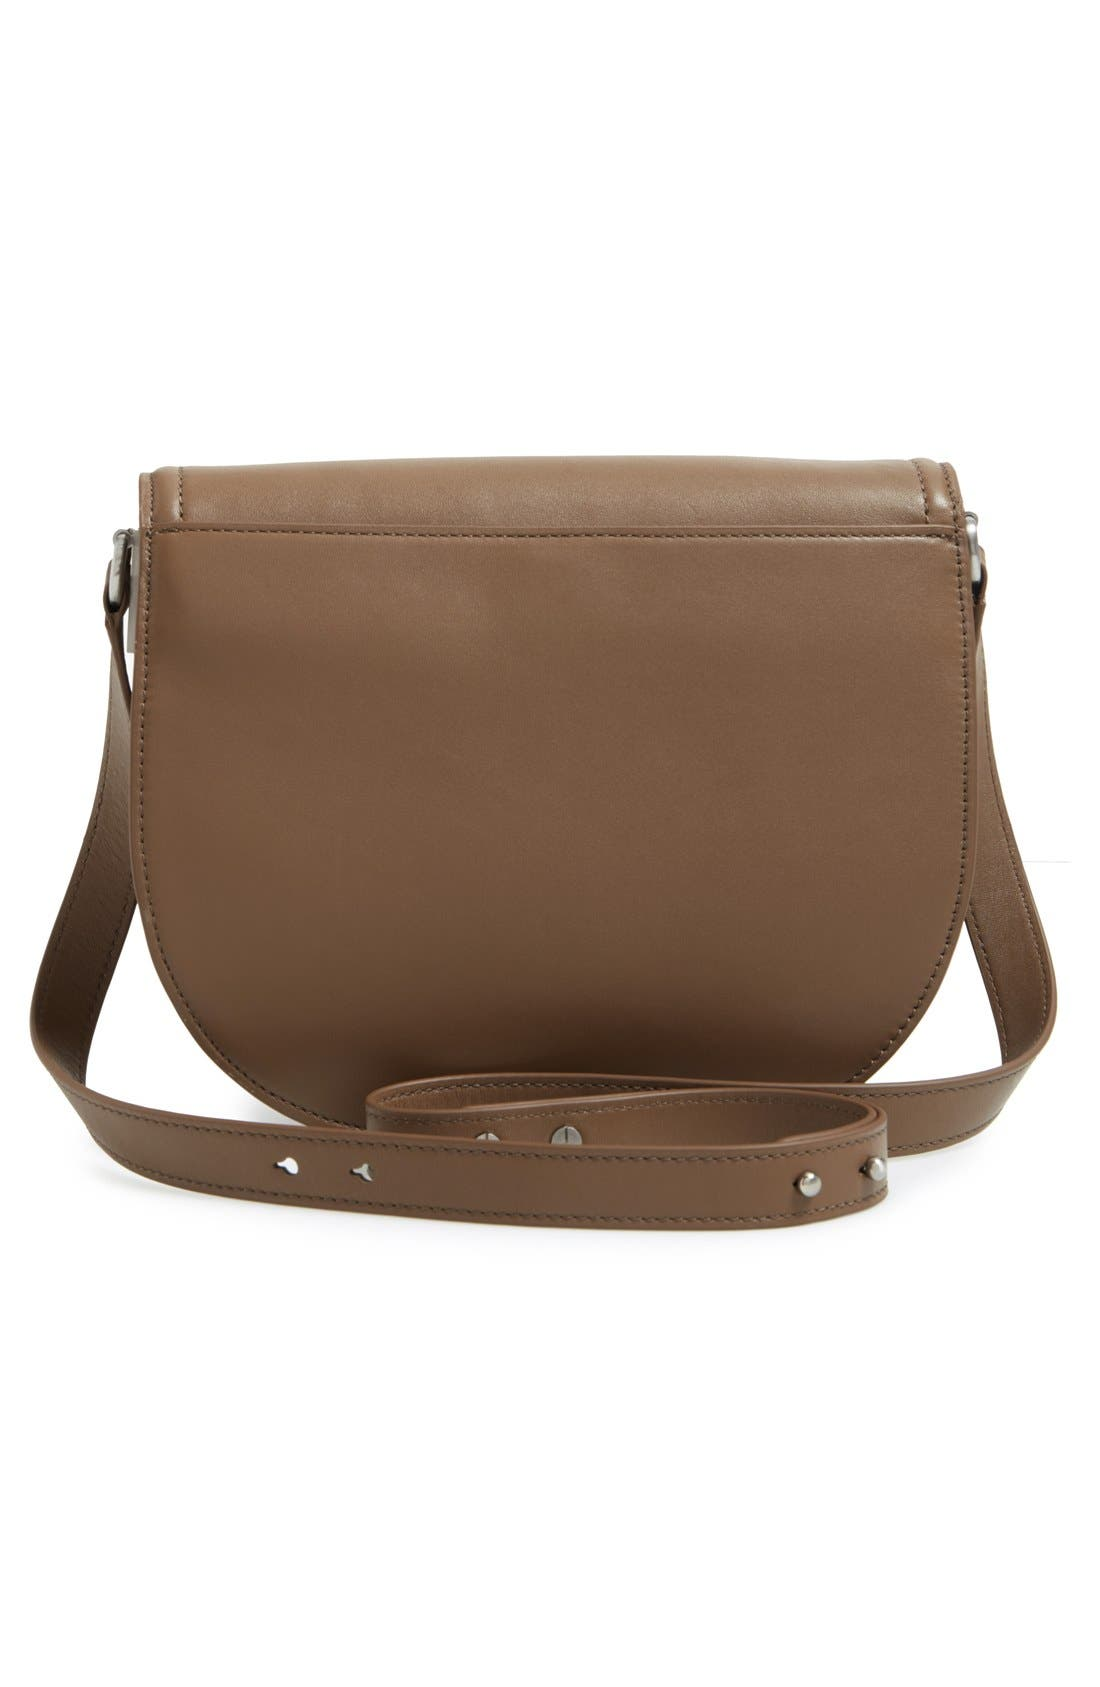 'Large' Leather Saddle Bag,                             Alternate thumbnail 4, color,                             300